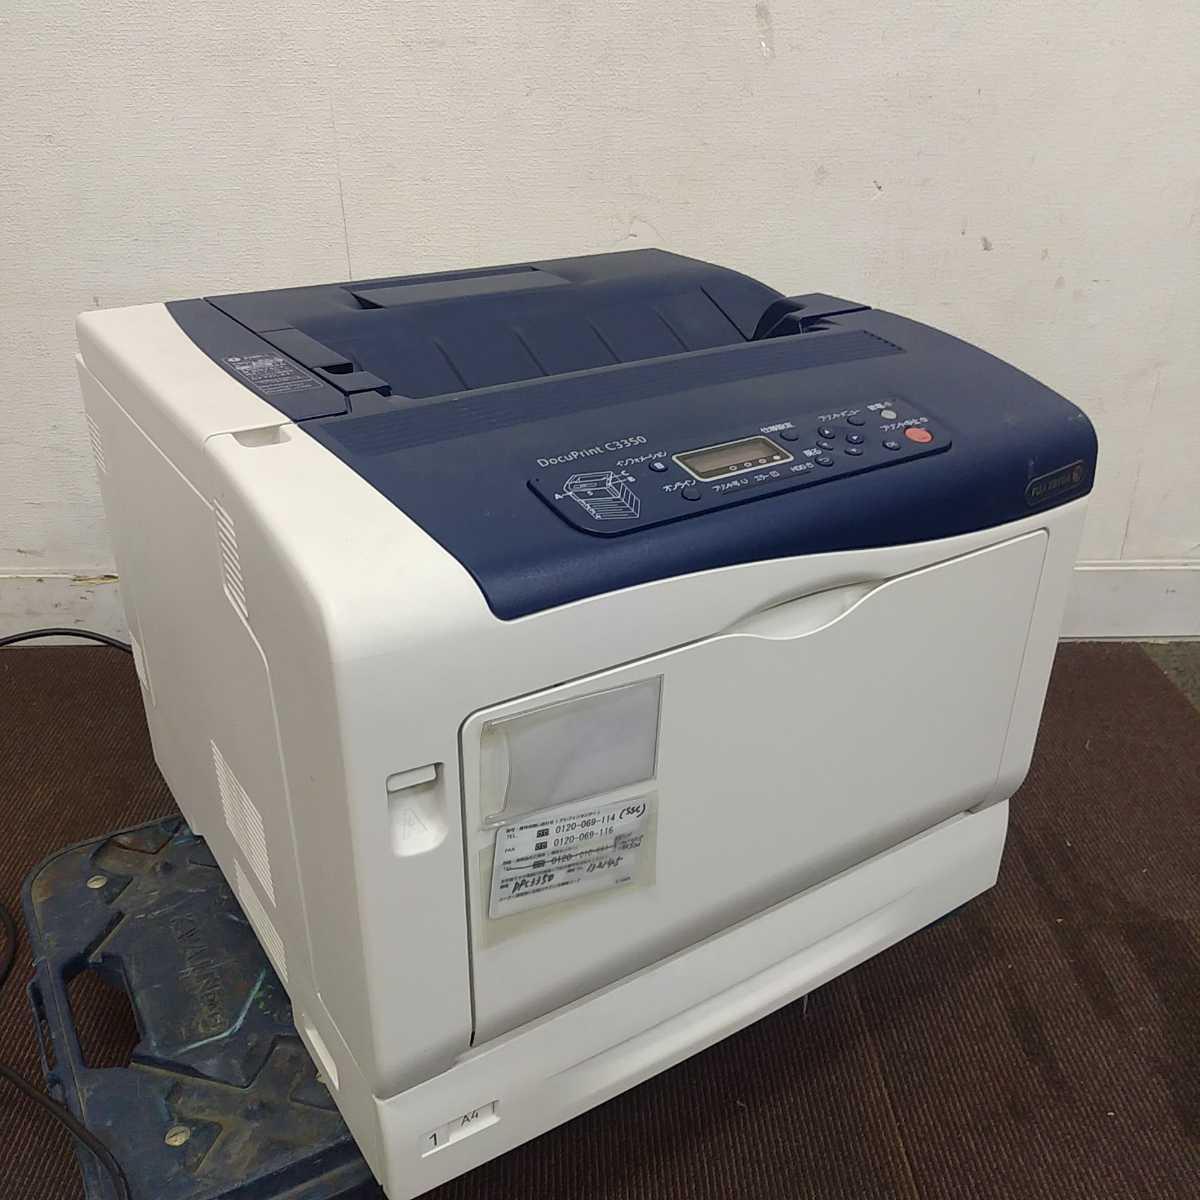 FUJI XEROX DocuPrint C3350 レーザープリンター 通電確認済み 現状品 プリンター 格安売り切りスタート☆_画像1